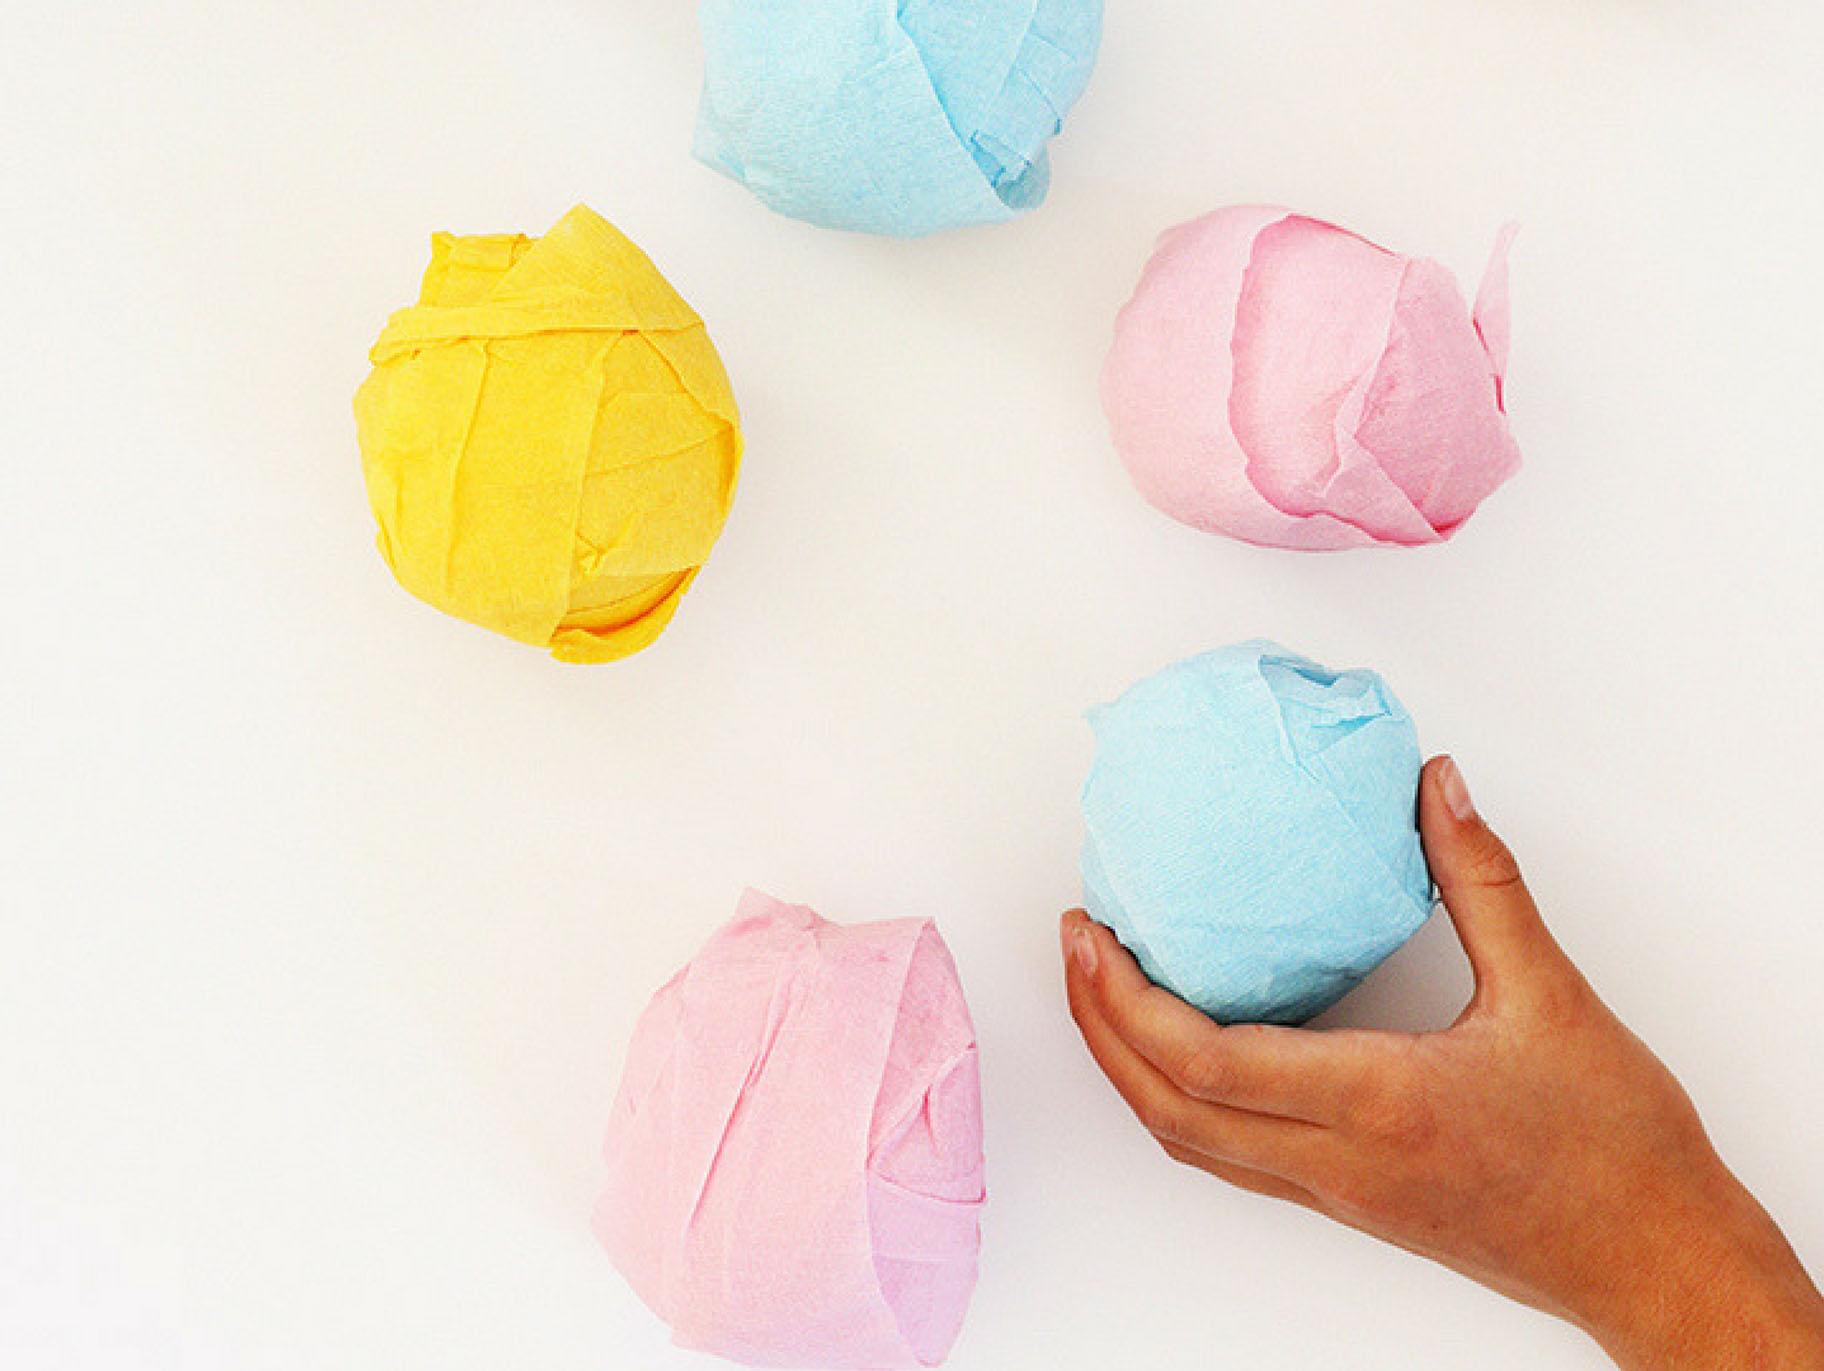 treasure ball Teddy Bear Surprise Balls || Bear birthday party favors hidden treasures prize ball crepe paper ball